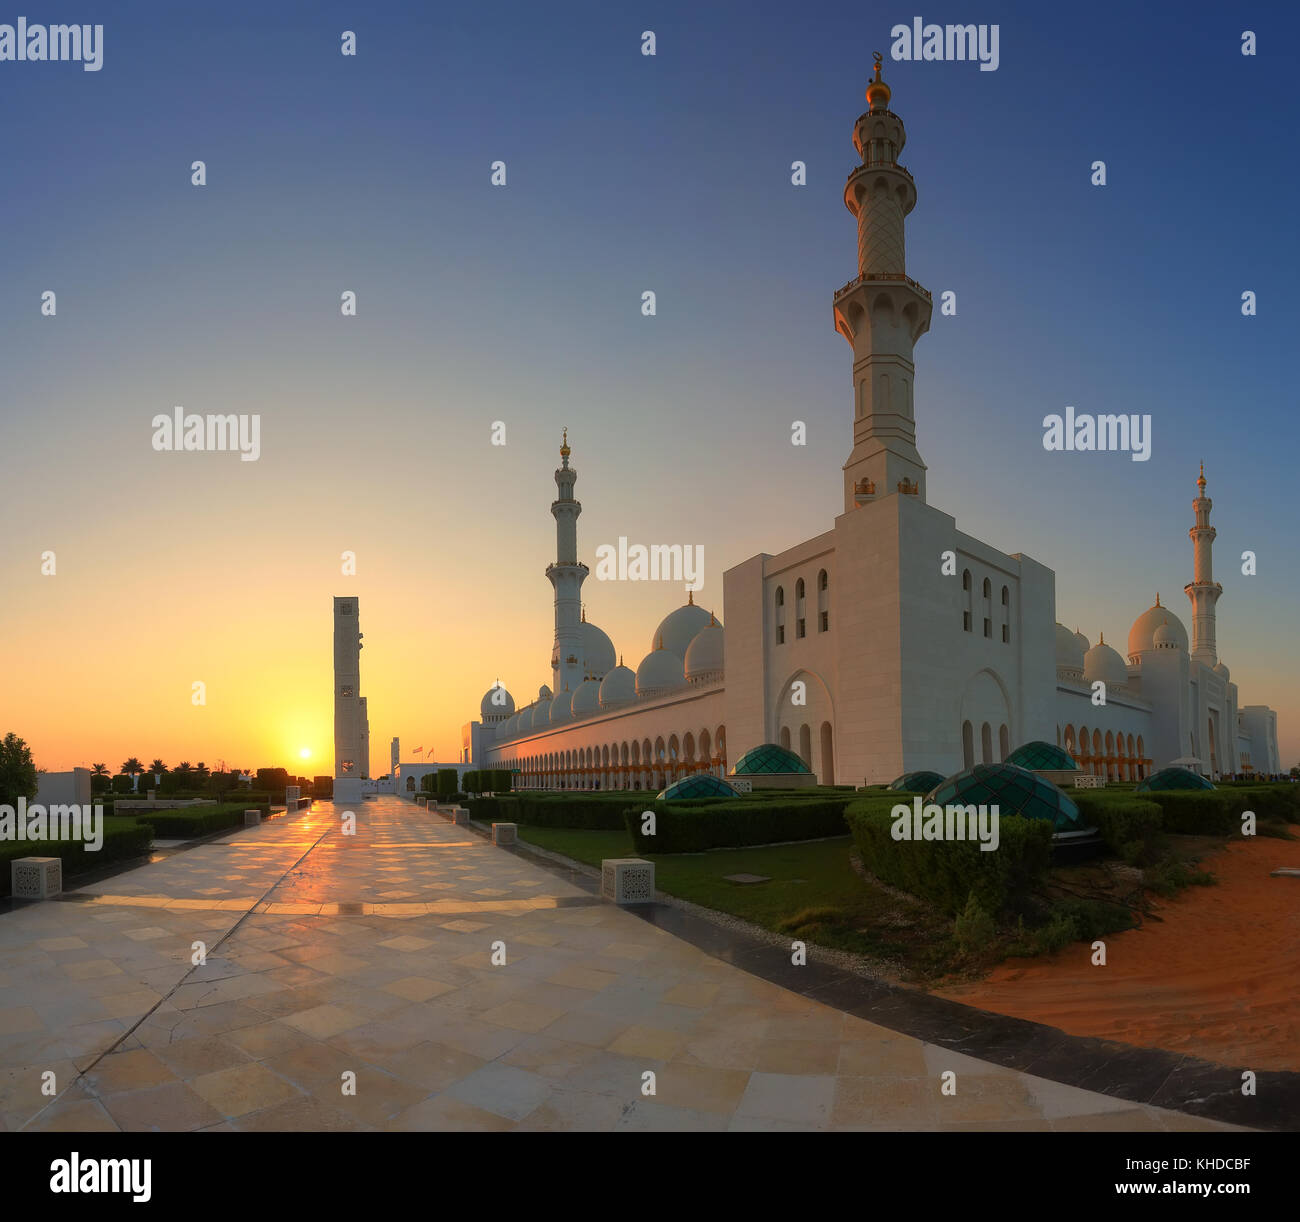 Sheikh Zayed Mosque in Abu Dhabi at the sunset. Evening sun illuminate white walls on Abu Dhabi mosque. - Stock Image